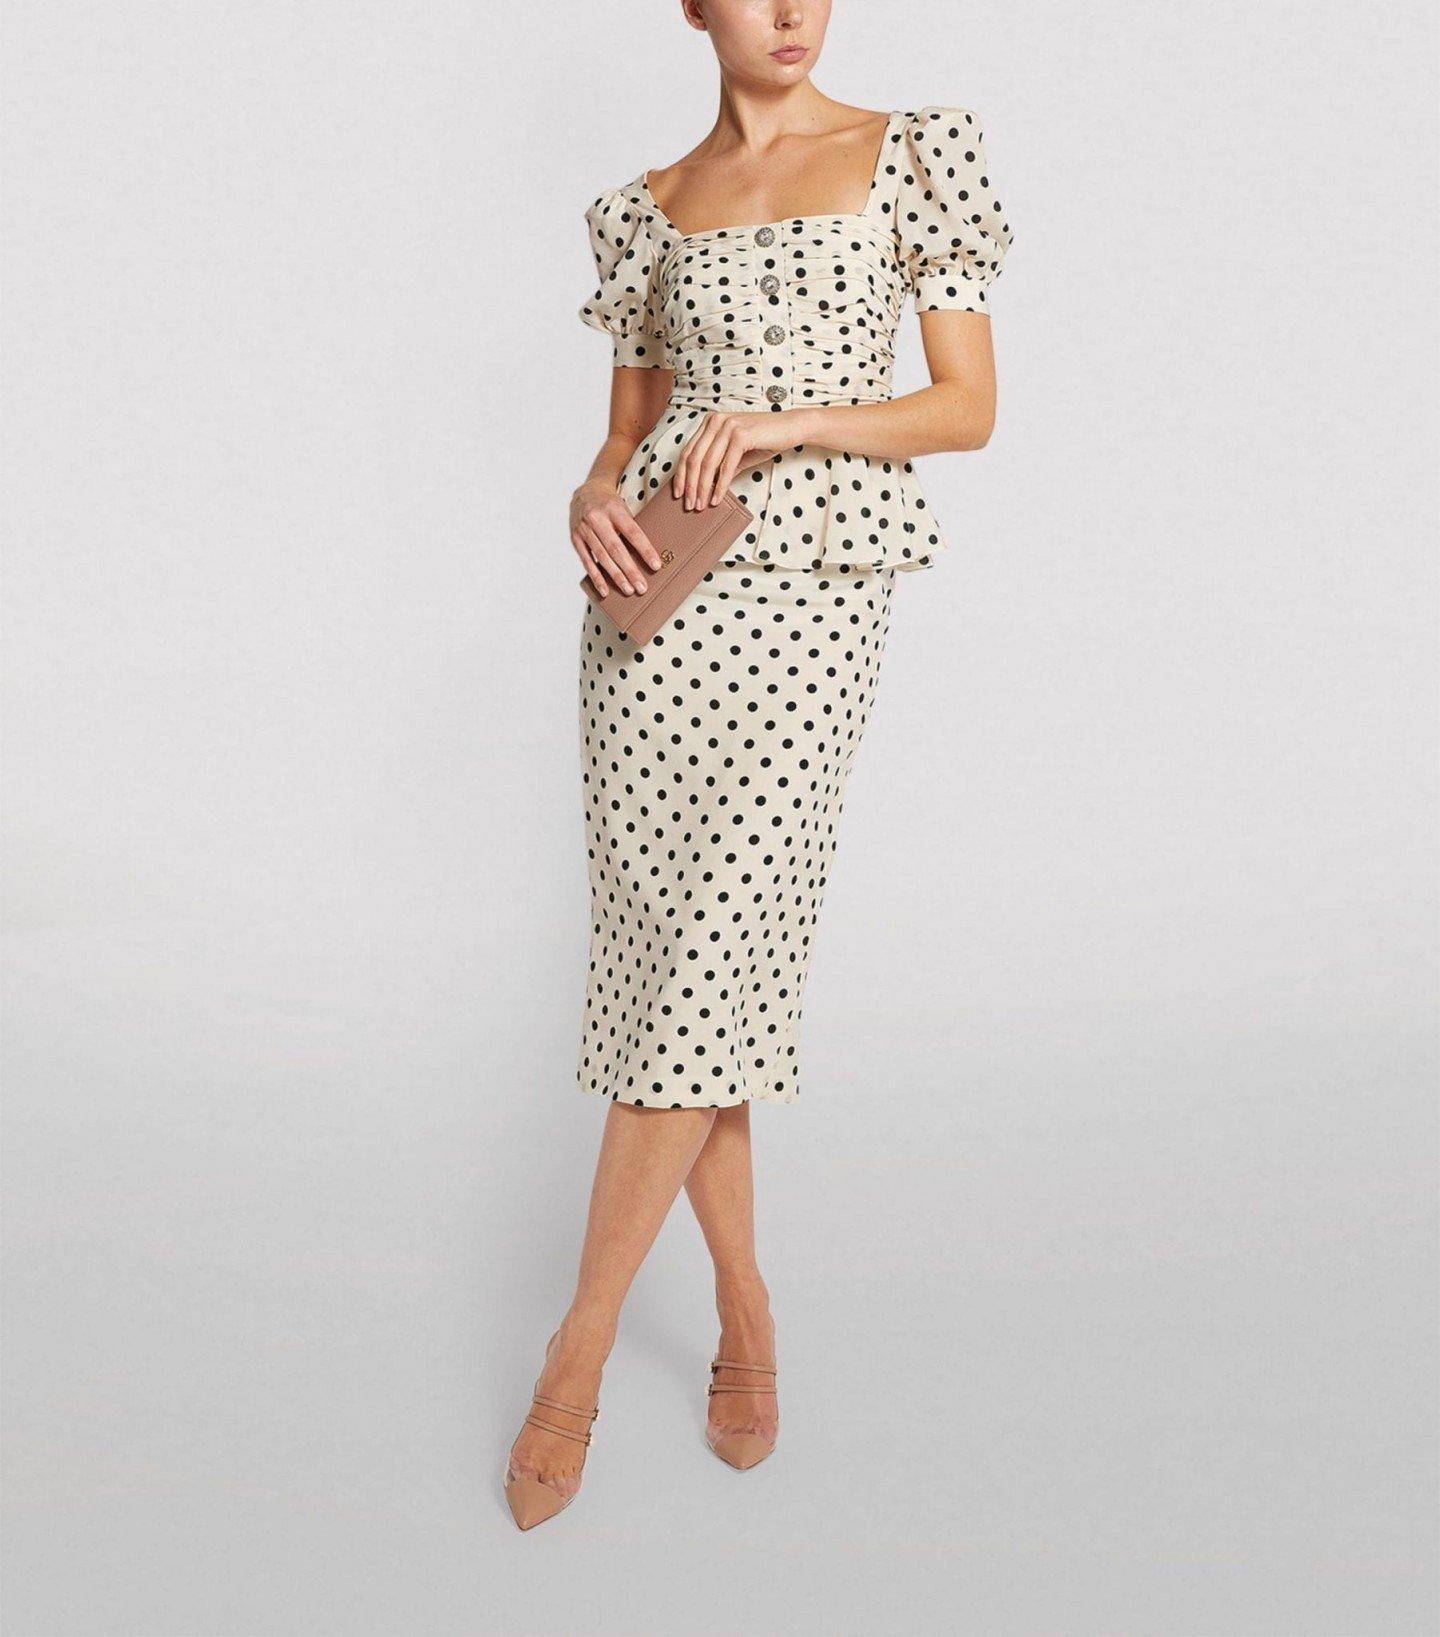 ALESSANDRA RICH Polka-Dot Ruched Dress